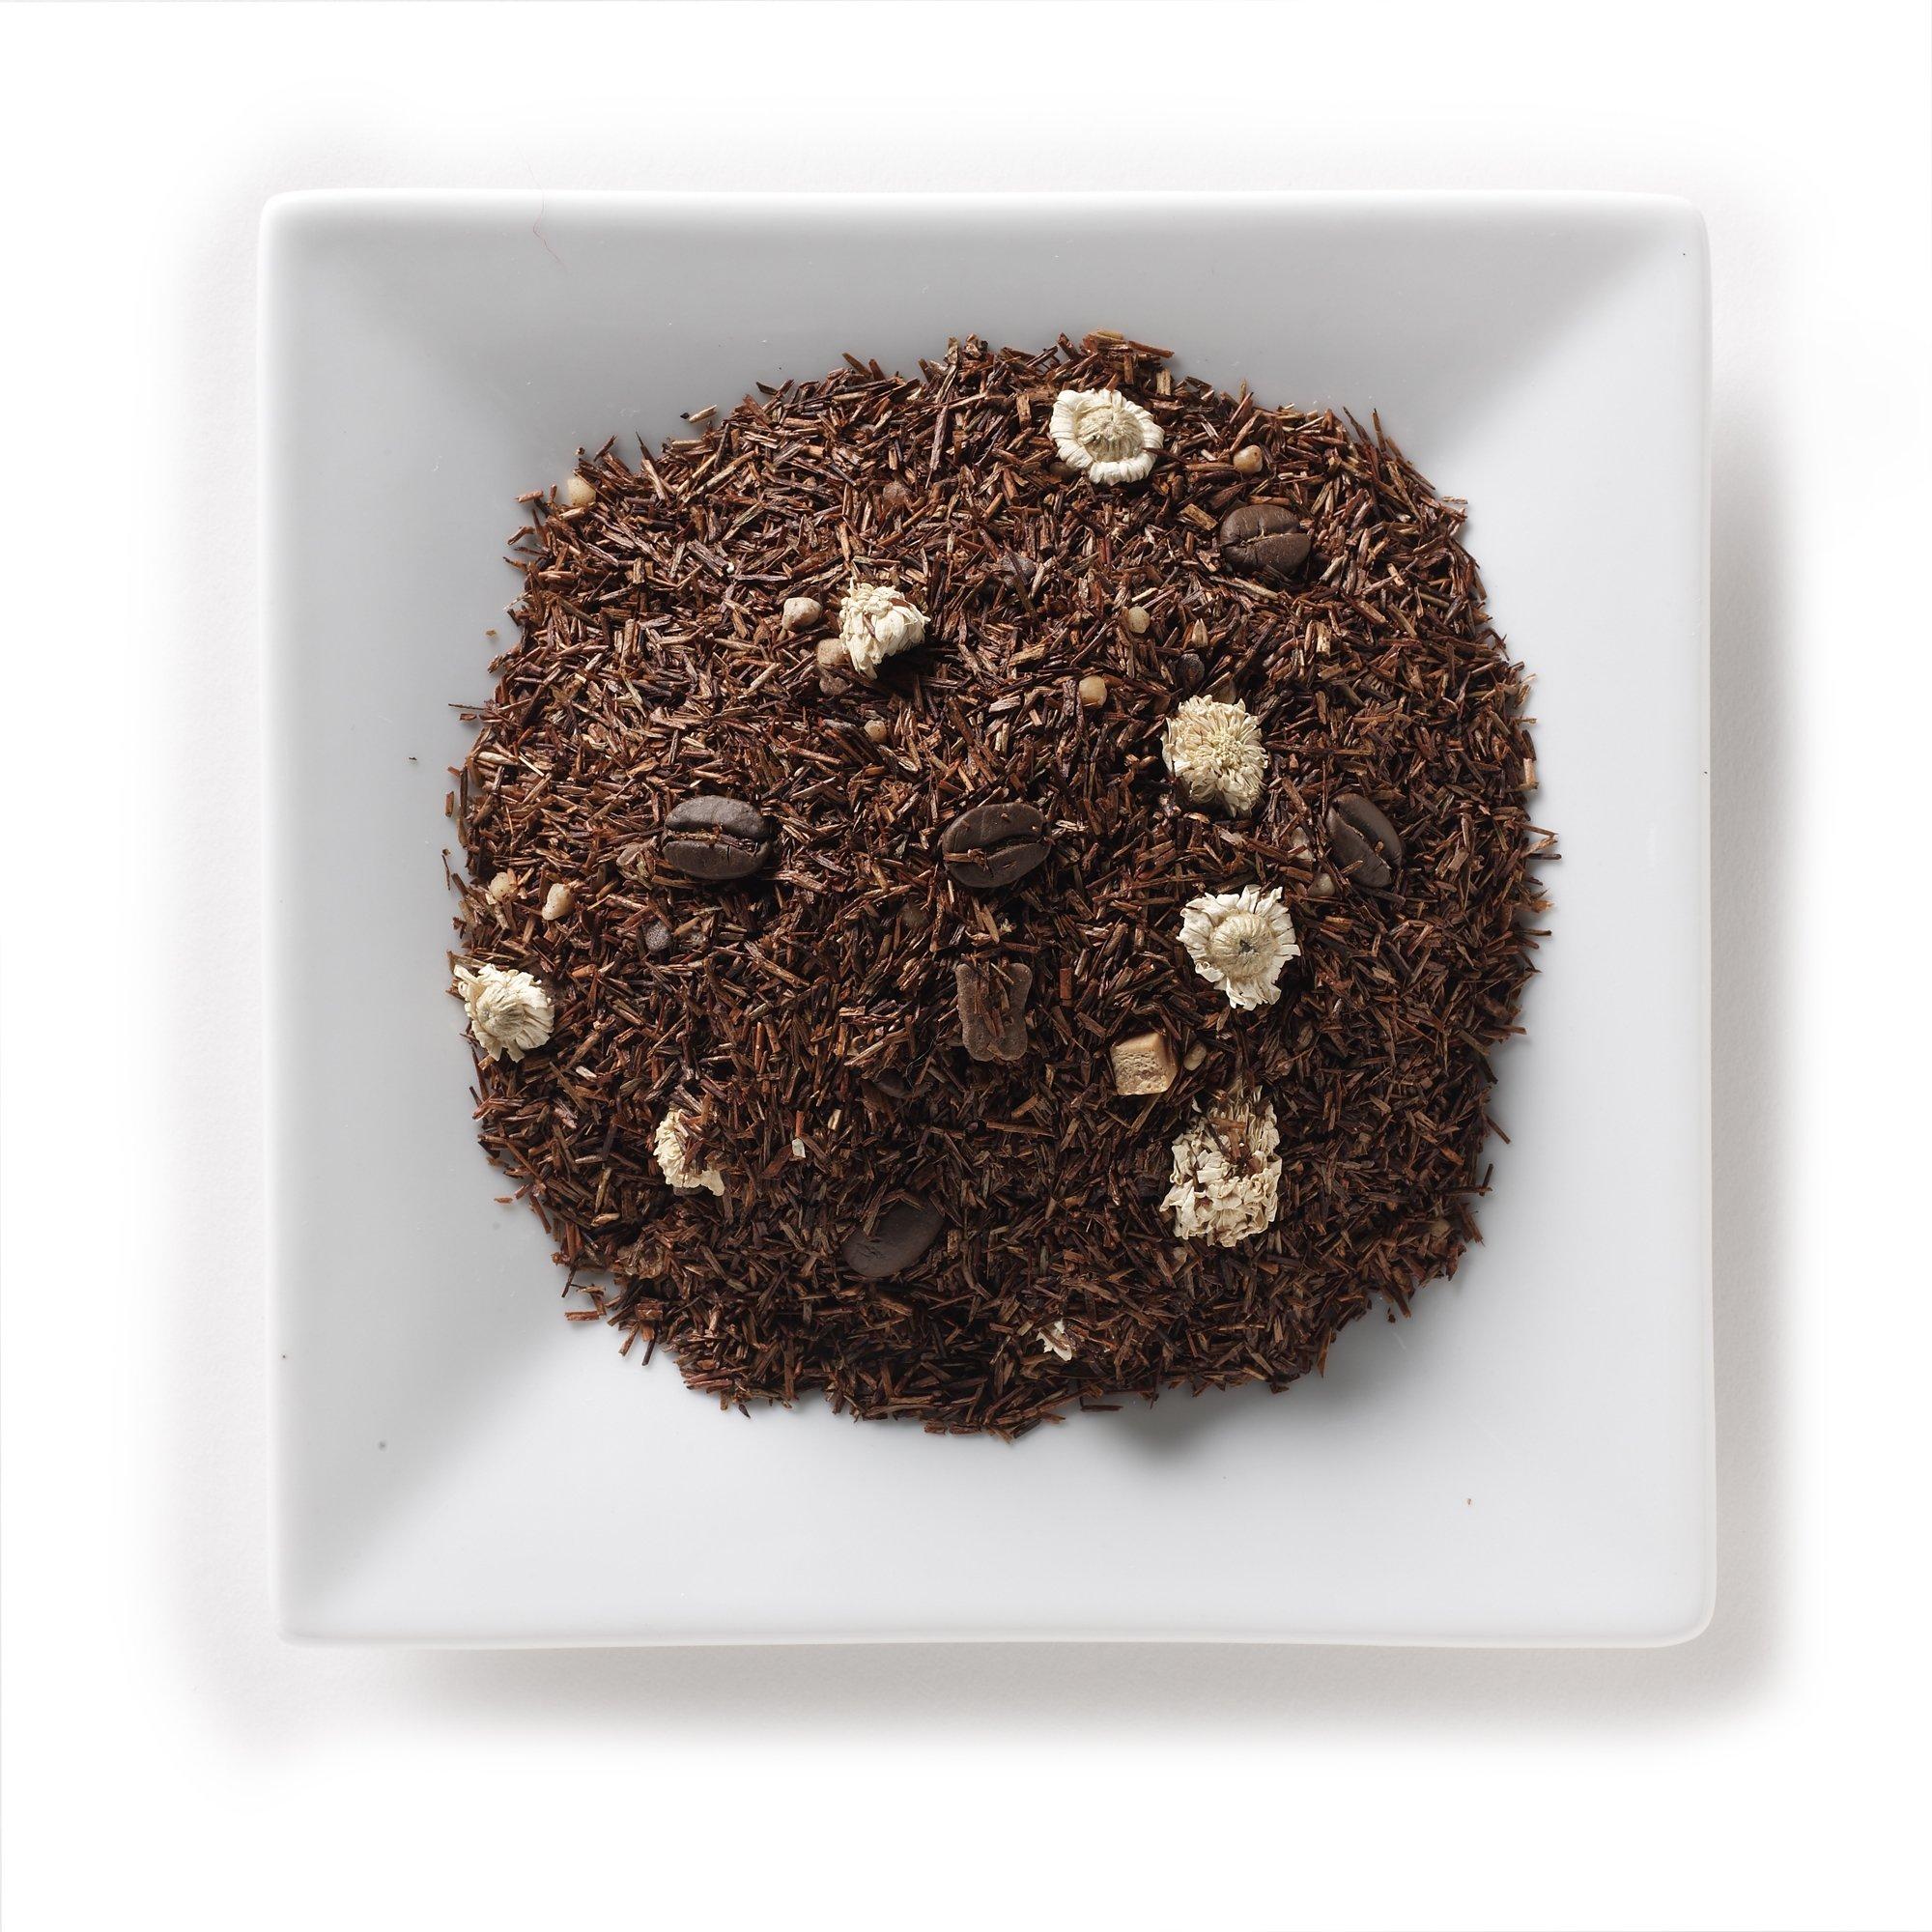 Mahamosa Tiramisu Rooibos Tea 2 oz, Loose Rooibos Herbal Tea Blend (with chocolate, coffee, caramel, yogurt) (dessert tea)